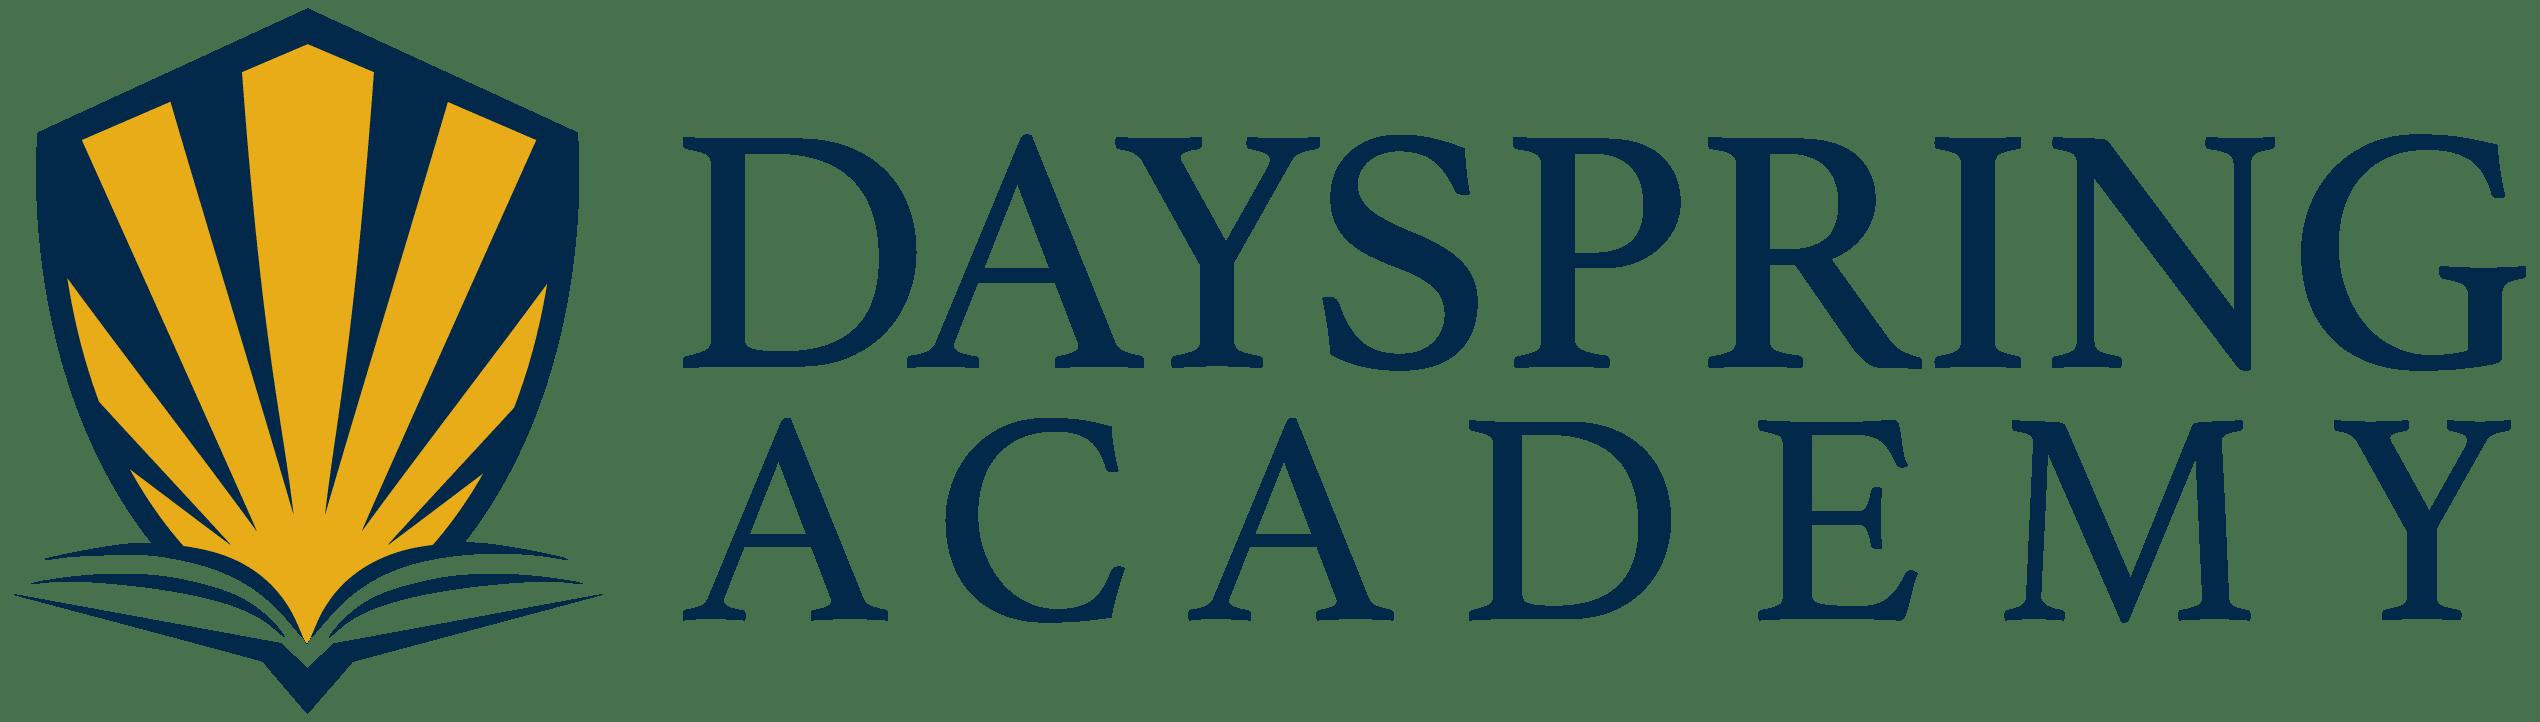 Dayspring Academy